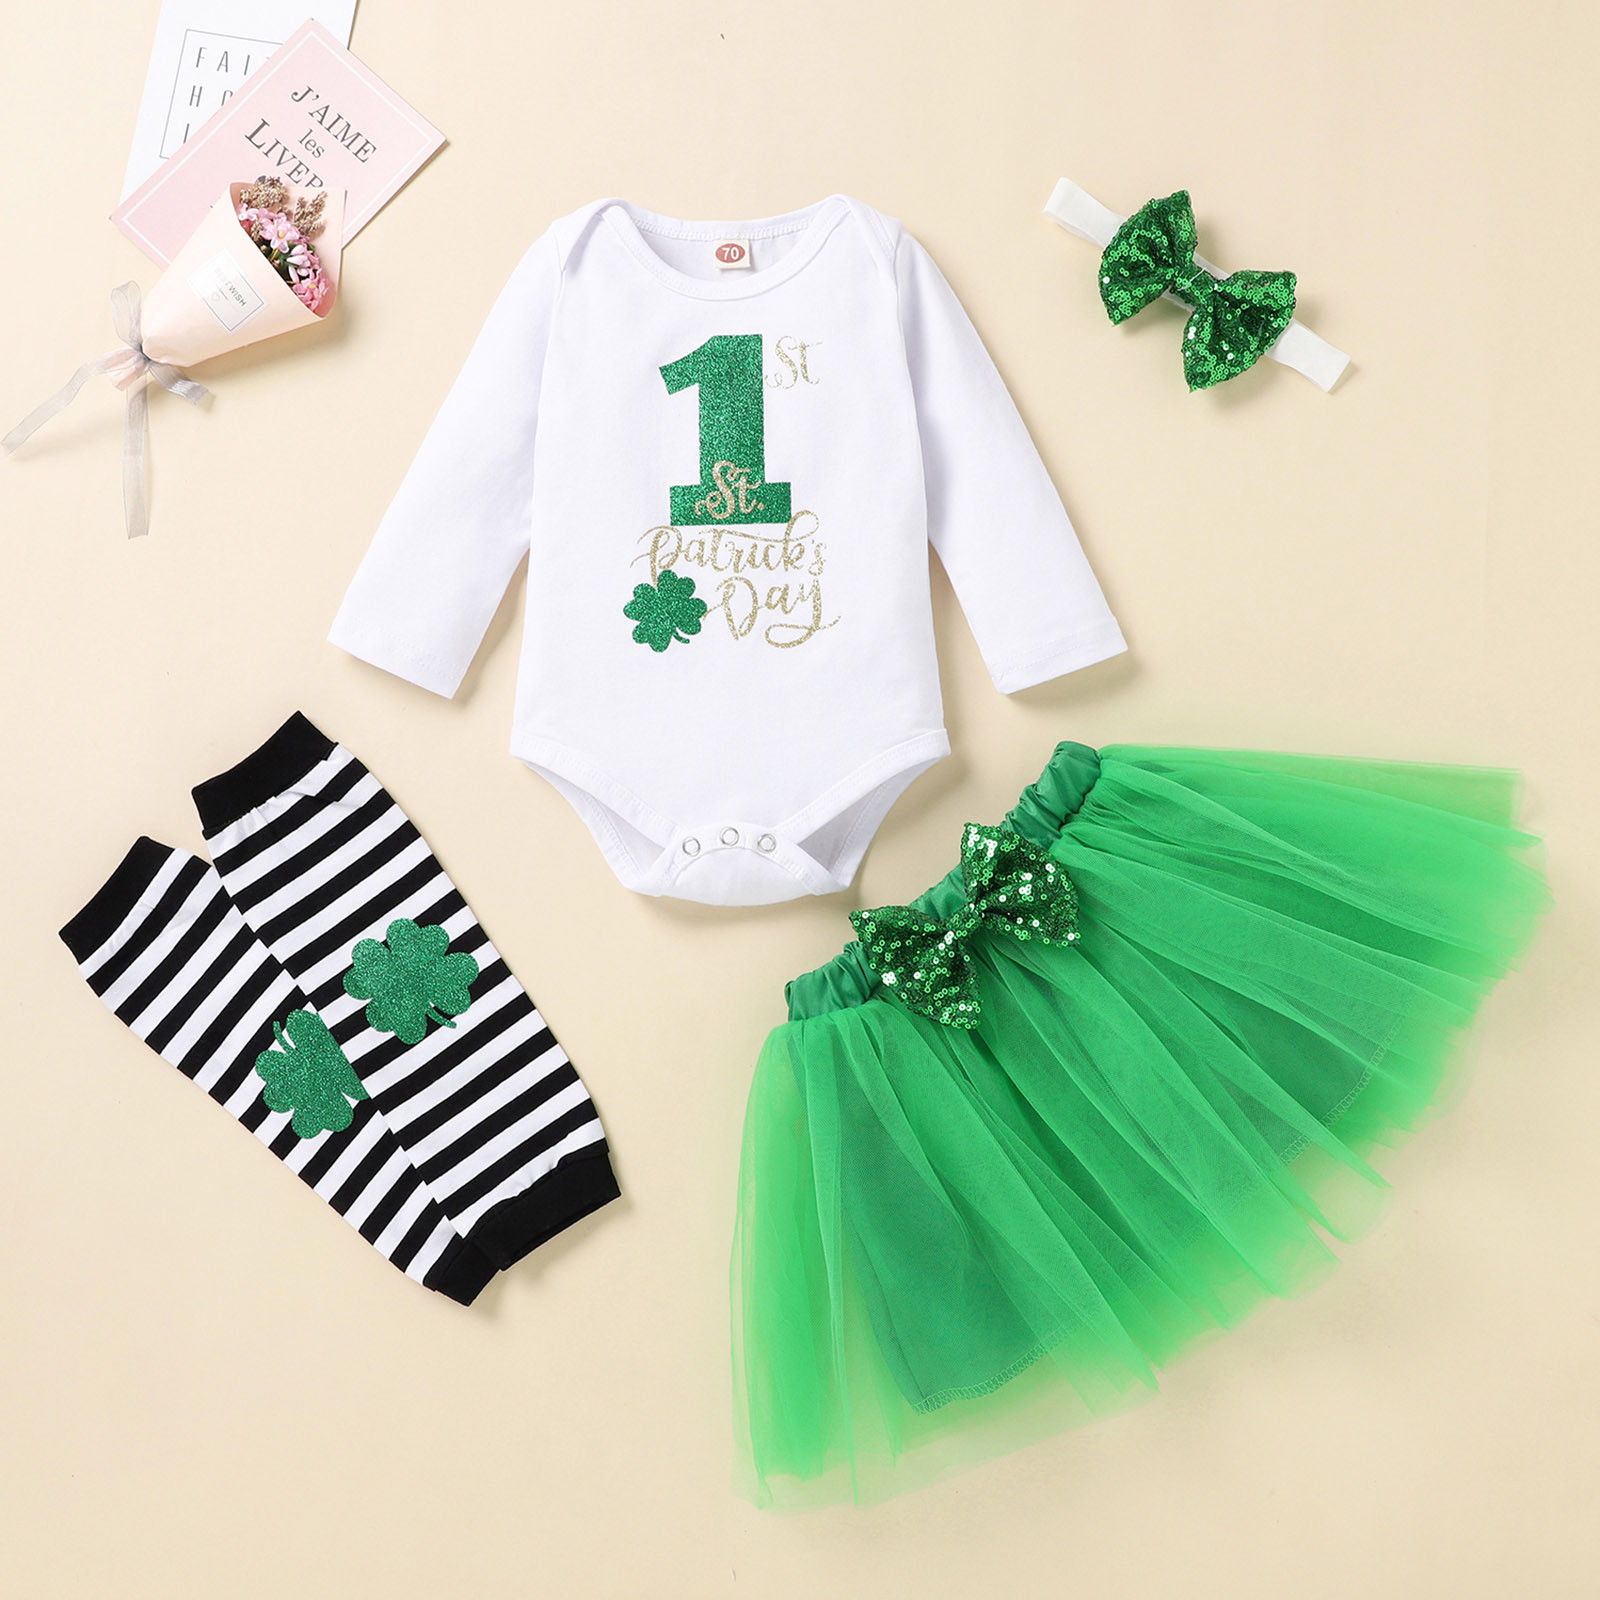 Tutu Romper Skirt Short Long-Sleeve Patrick's Newborn Baby-Girls Letter 0-24M St. Irish